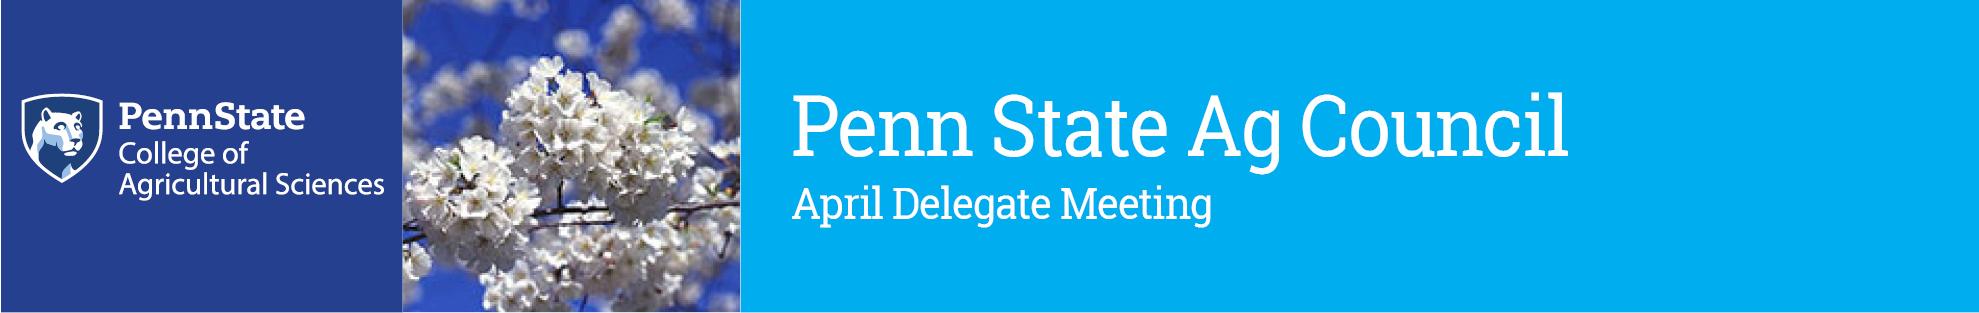 2017 Penn State Ag Council April Delegate Meeting